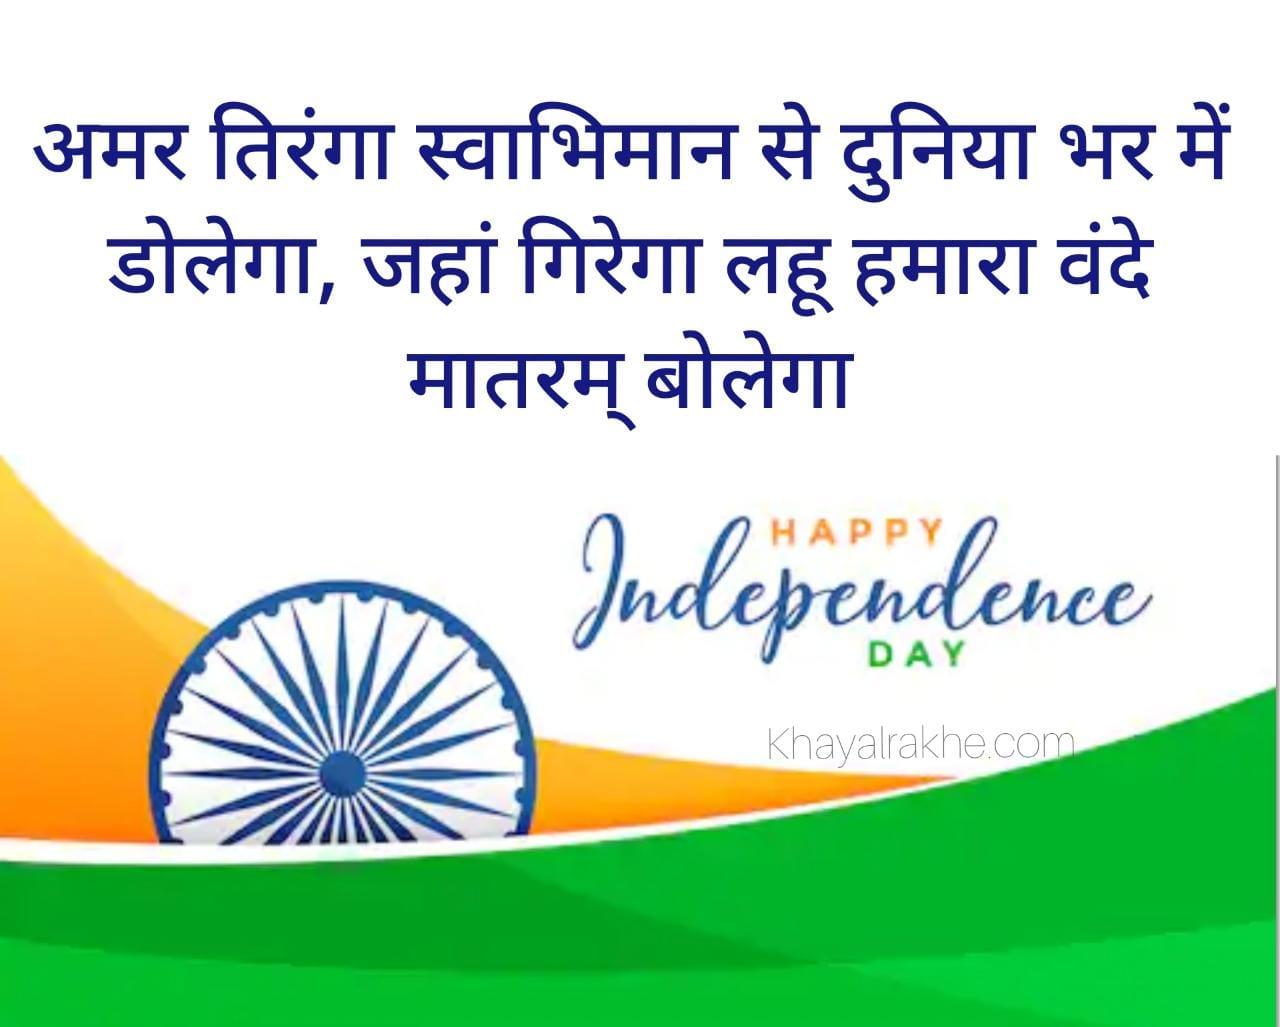 15 अगस्त स्वतंत्रता दिवस स्टेटस 2020 – Independence Day Status in Hindi